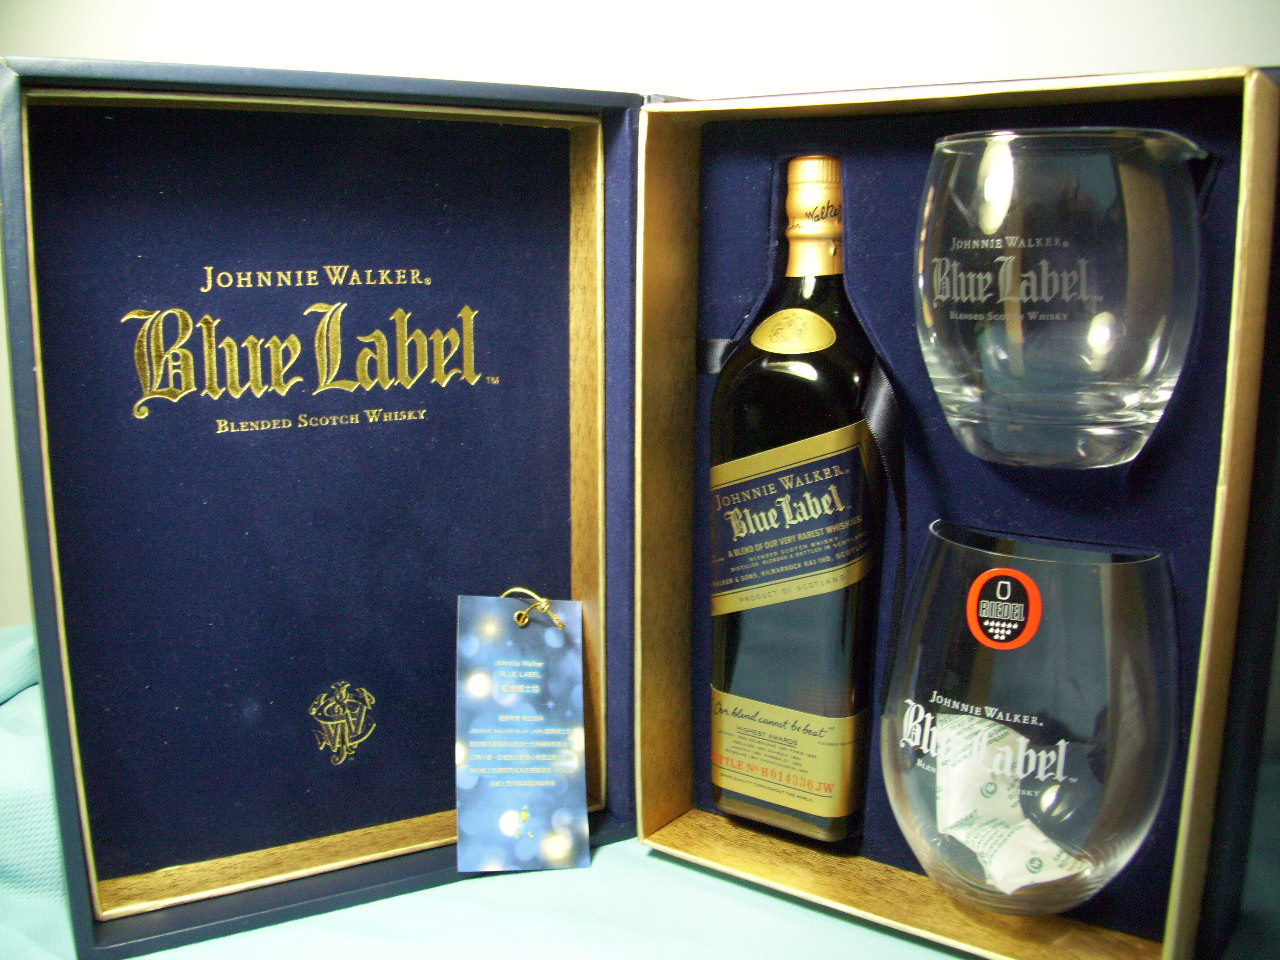 JOHNNIE WALKER Blue Label 500ml Bottle + Crystal glass GIFT set for collection